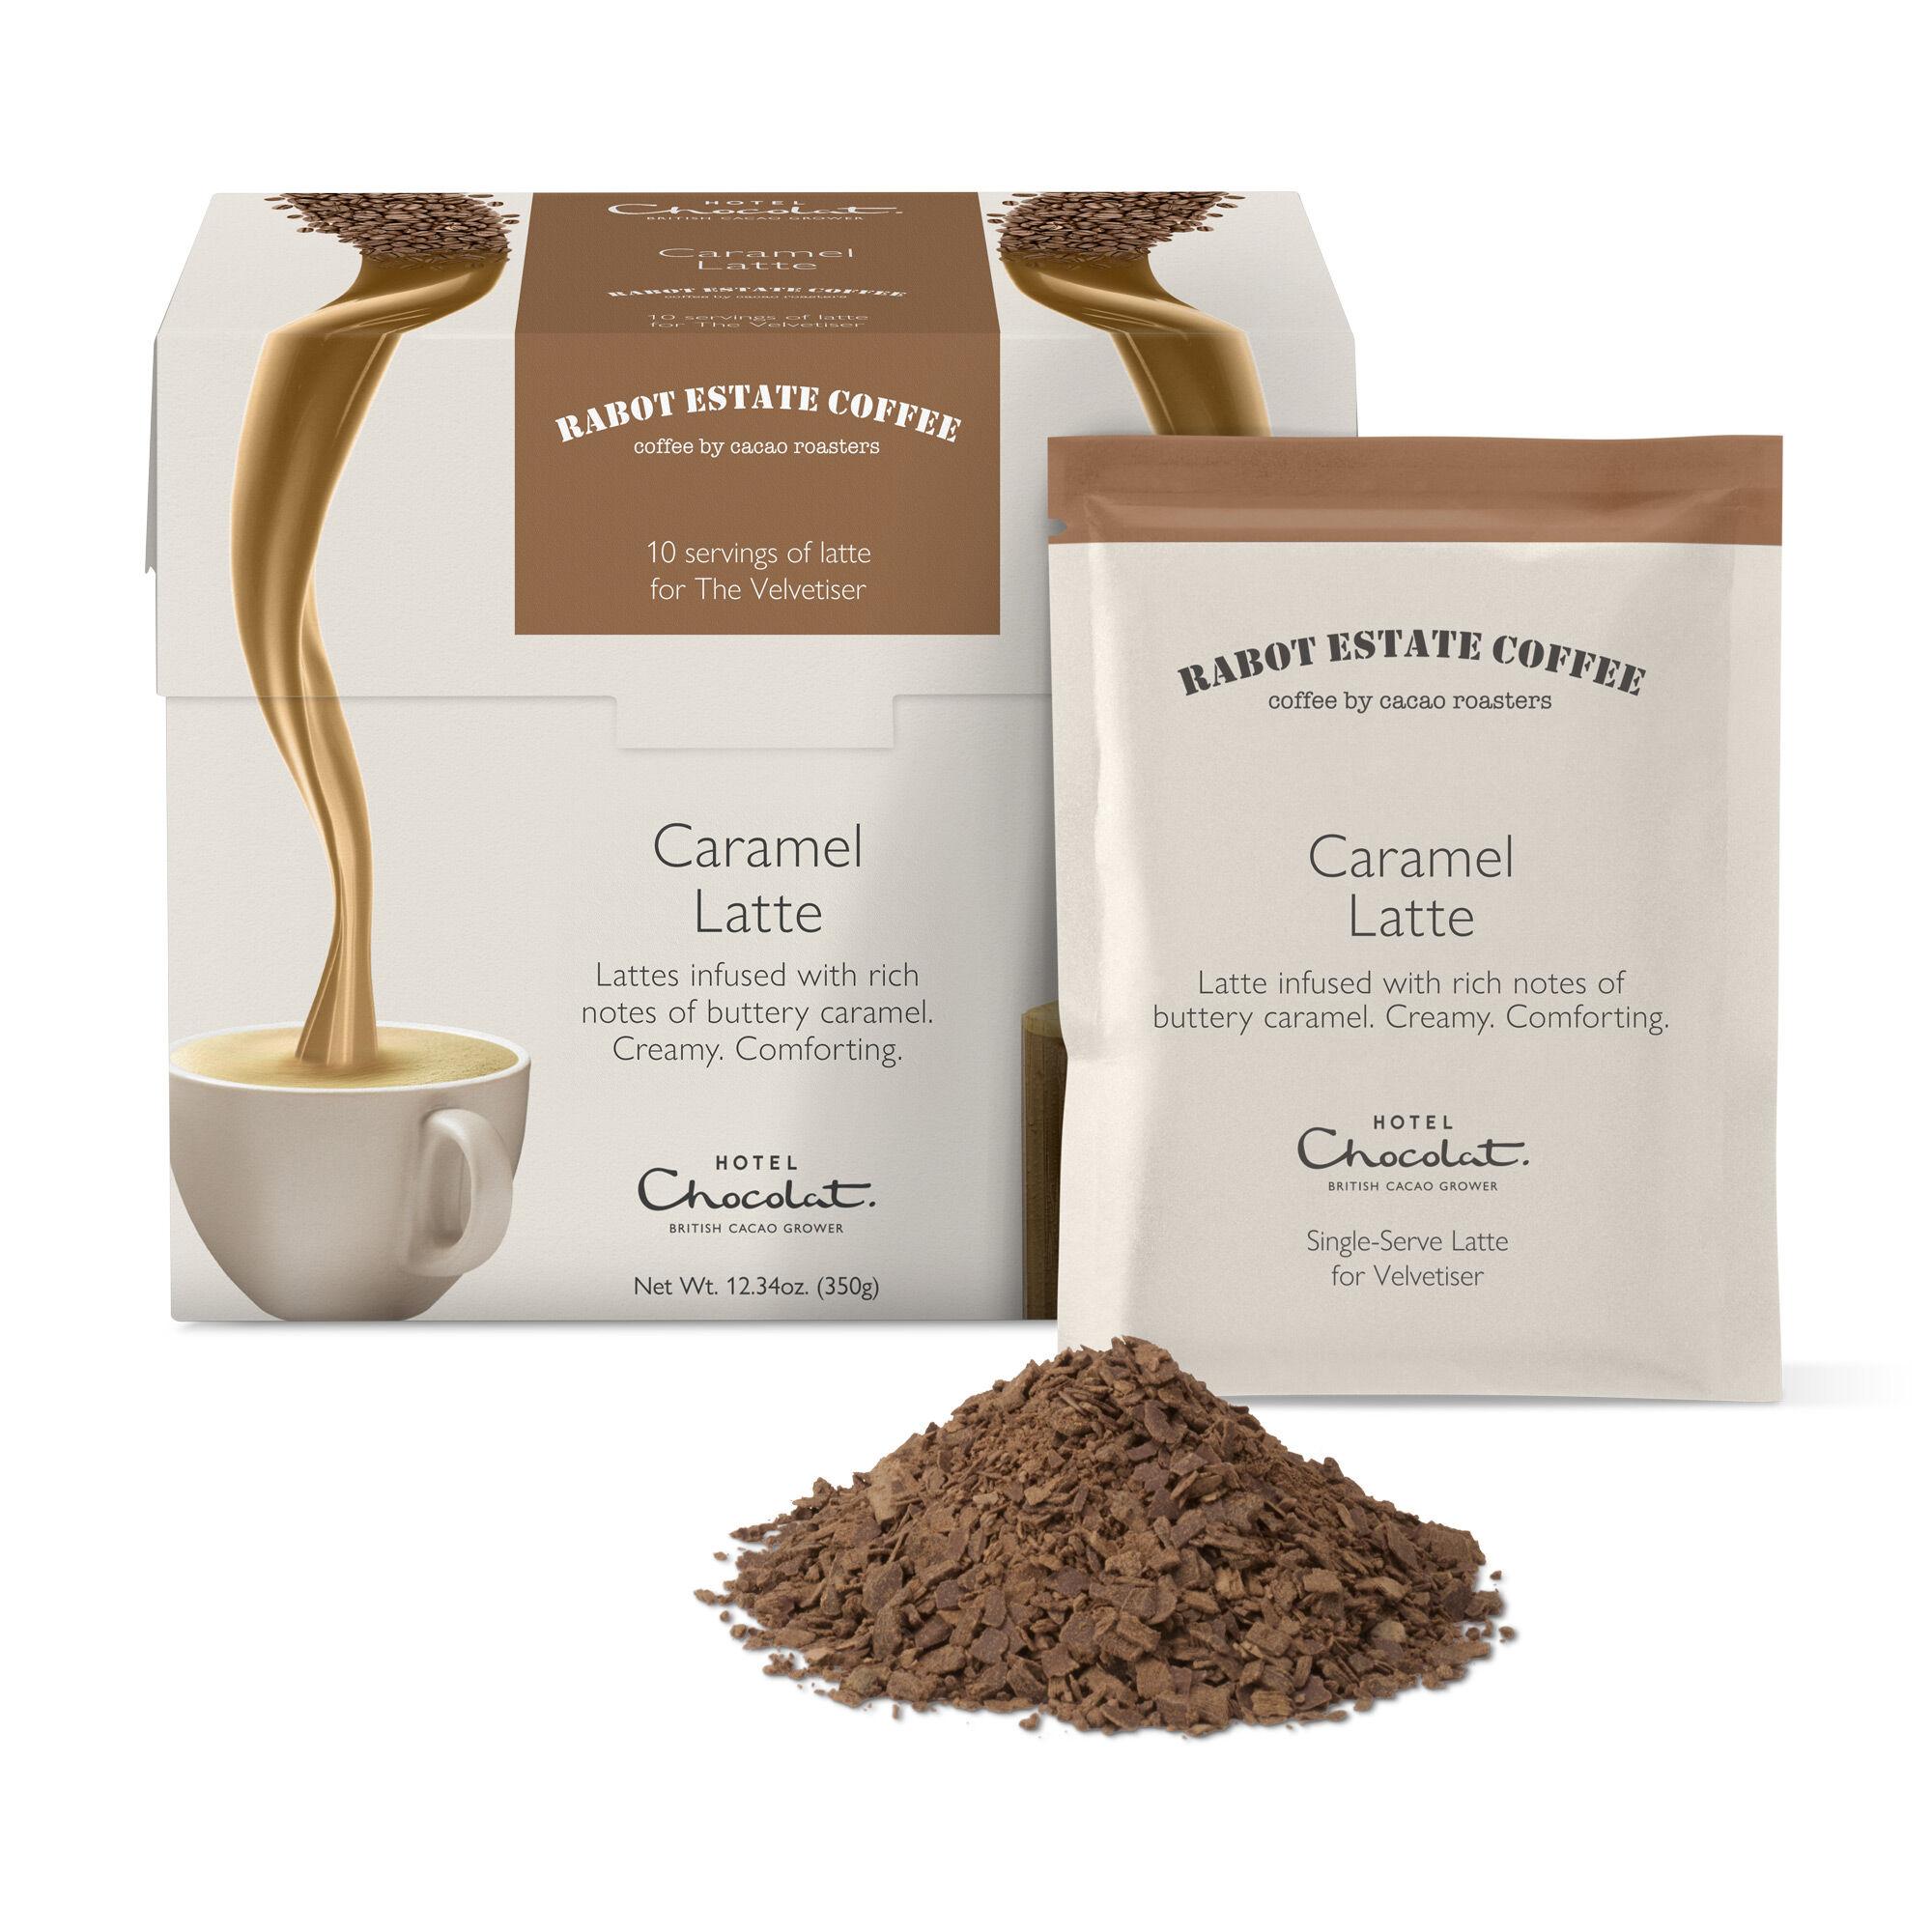 NEW Caramel Latte